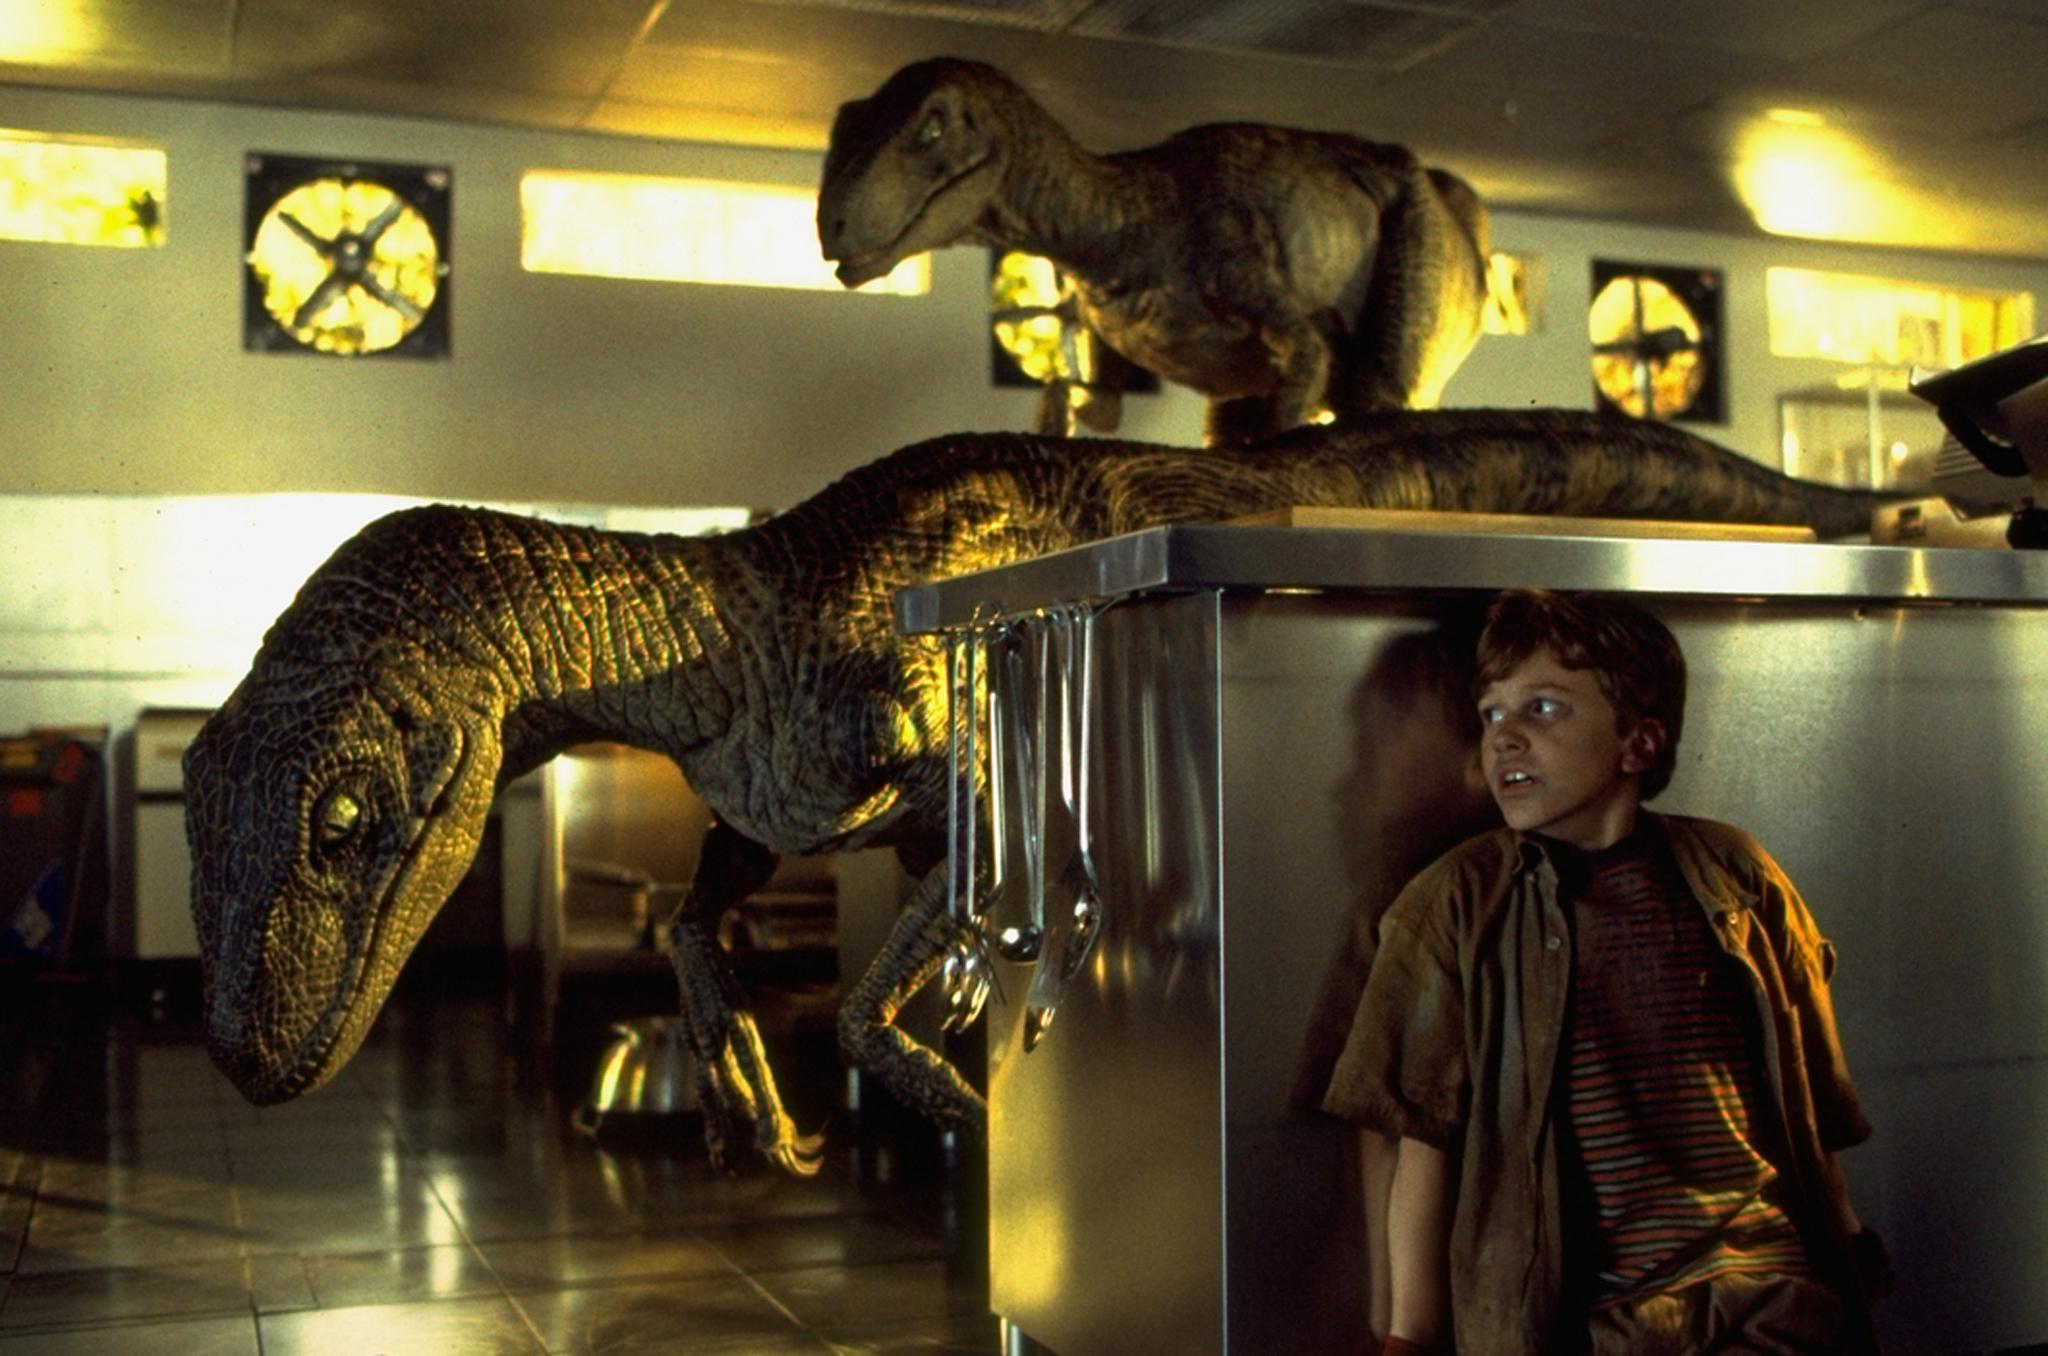 Sci-fi movie: Jurassic Park